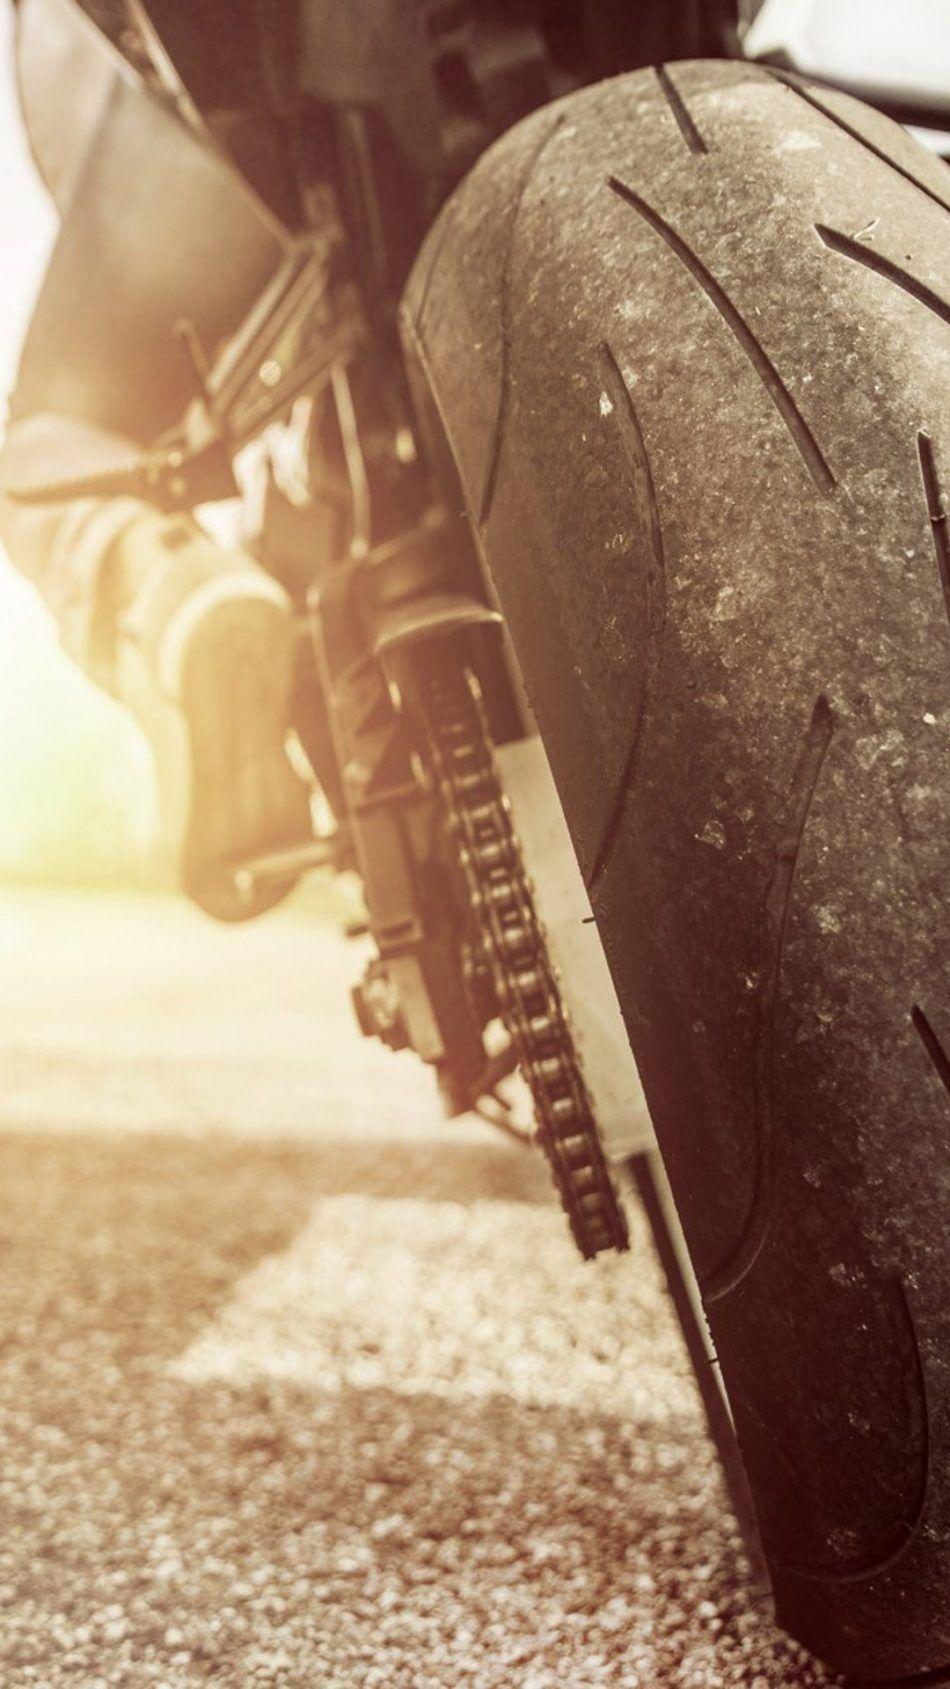 Rear Street Racing Sports Bike 4k Ultra Hd Mobile Wallpaper Sport Bikes Sports Bikes Motorcycles Bike Photoshoot